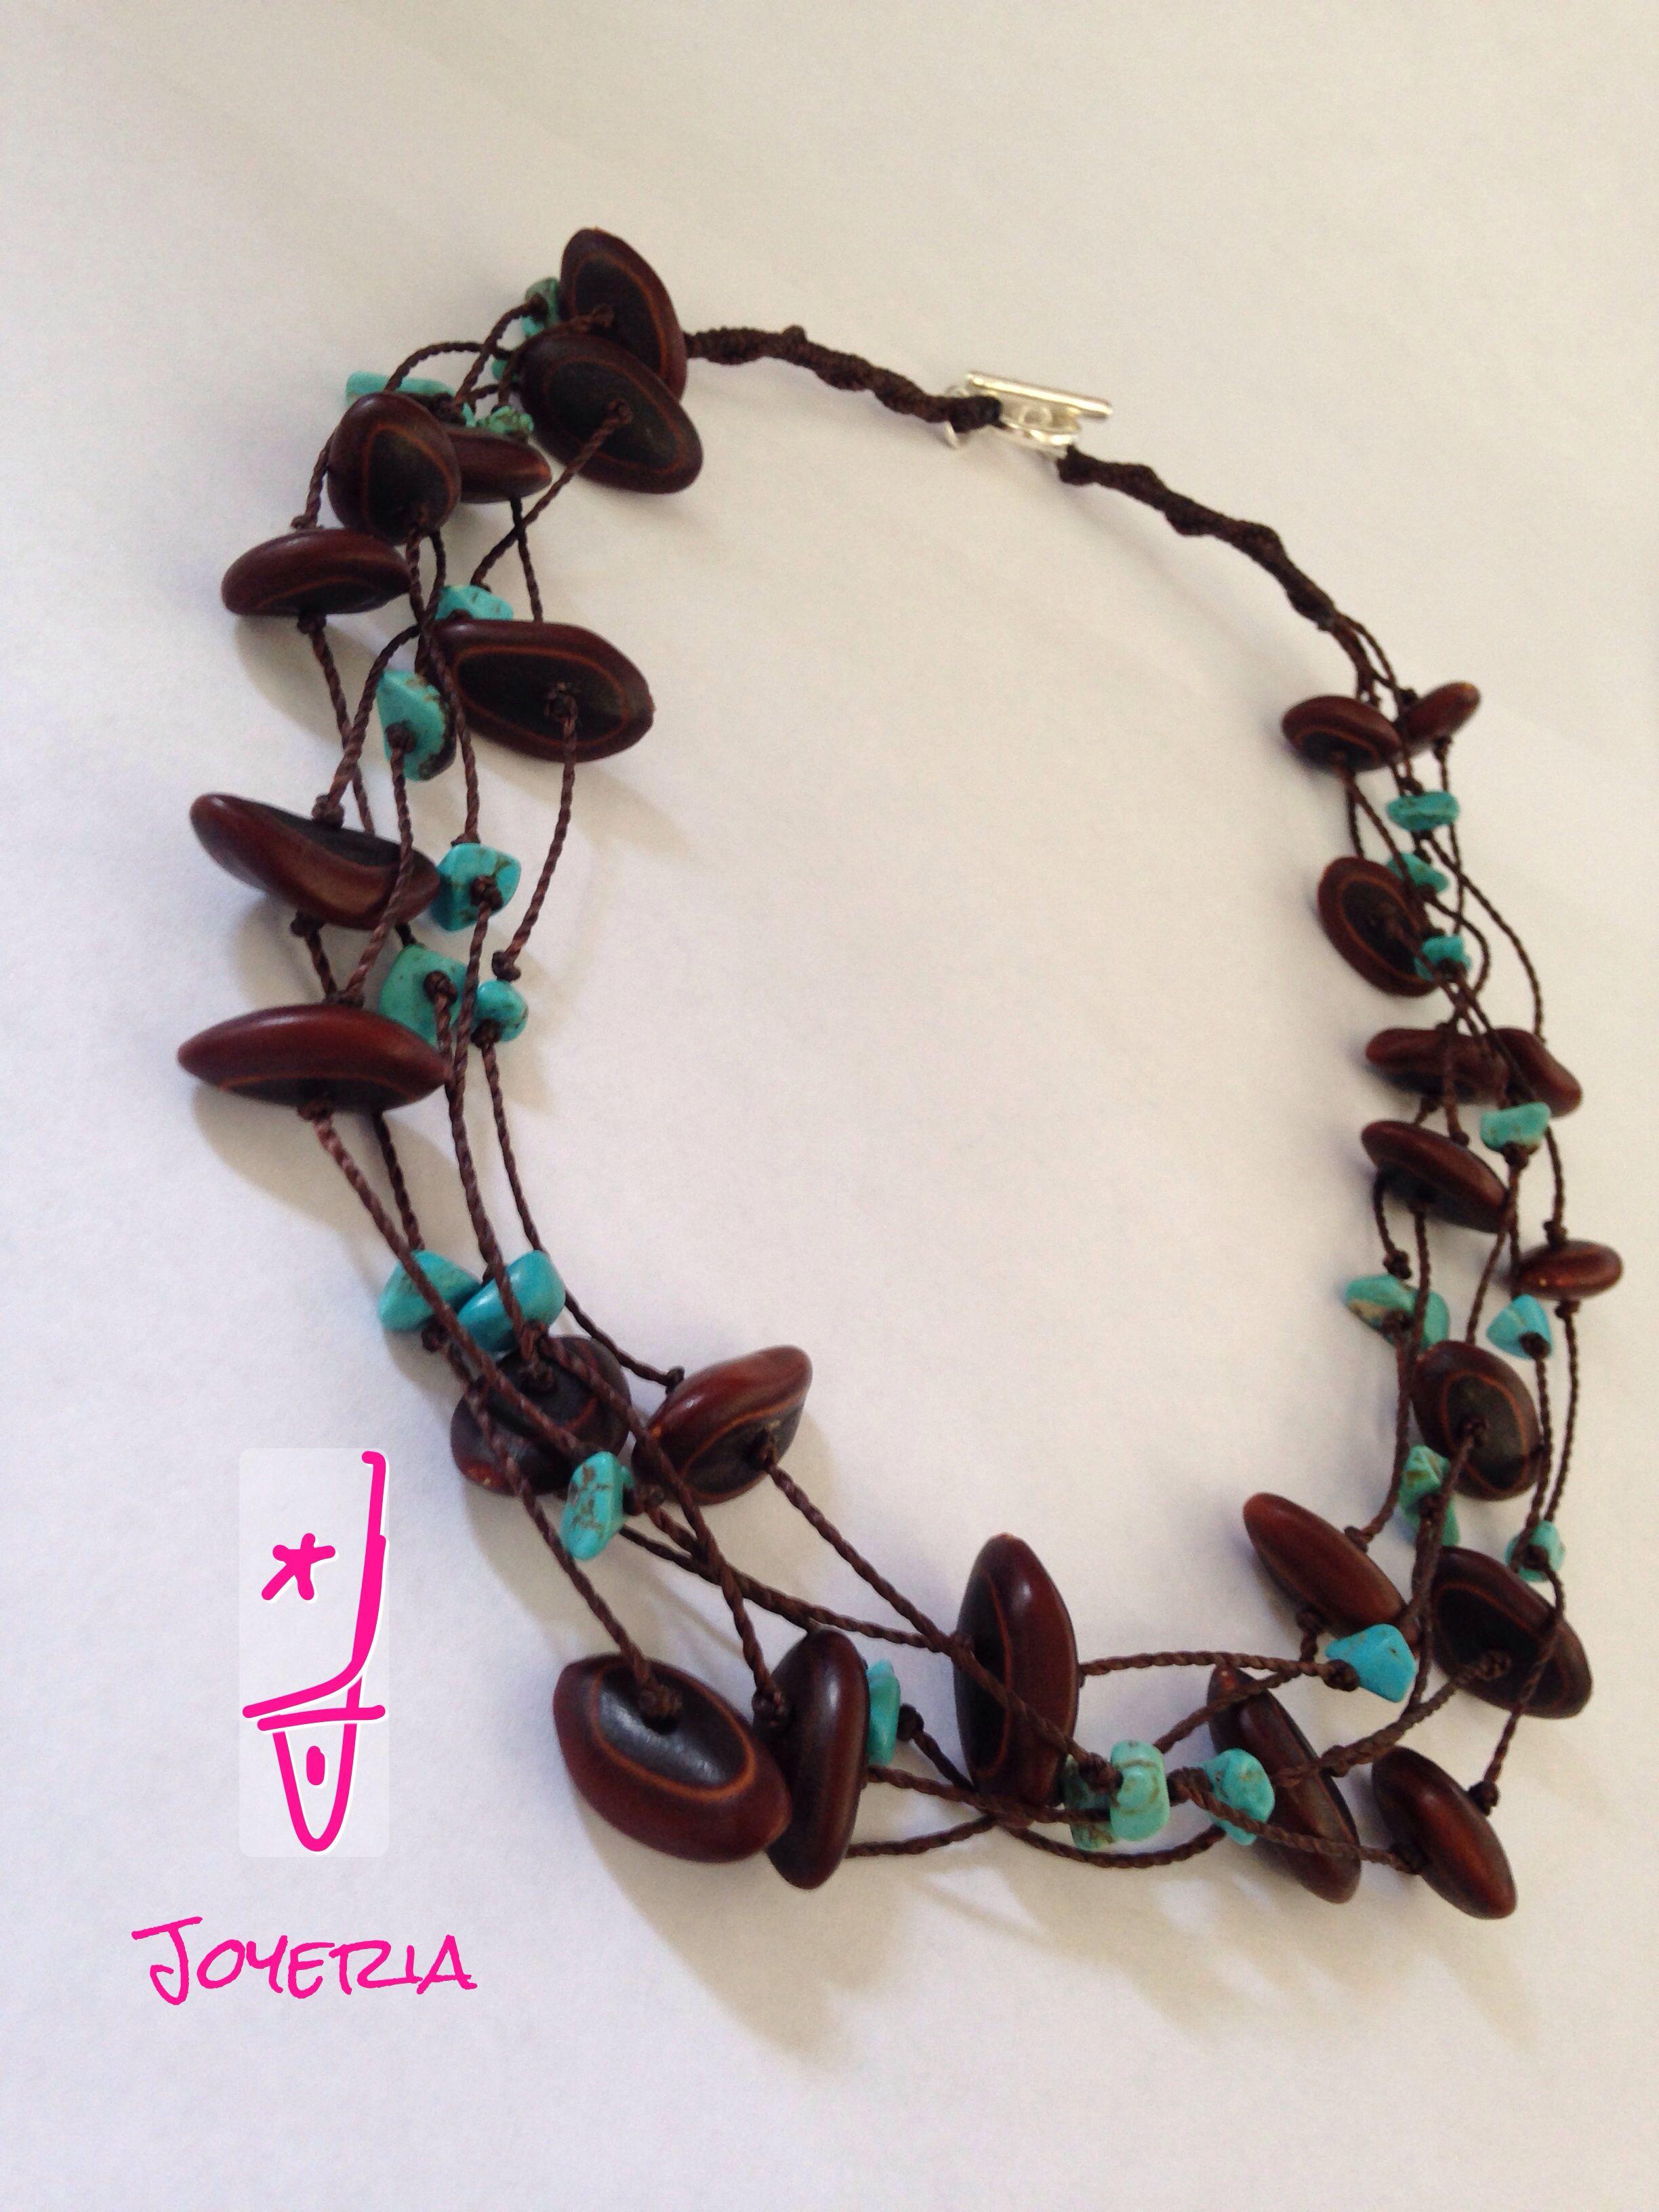 f2e60a8a3857 Collar de semillas de Guanacaxtle y piedra turquesa. Oaxaca mexico Collares  Largos